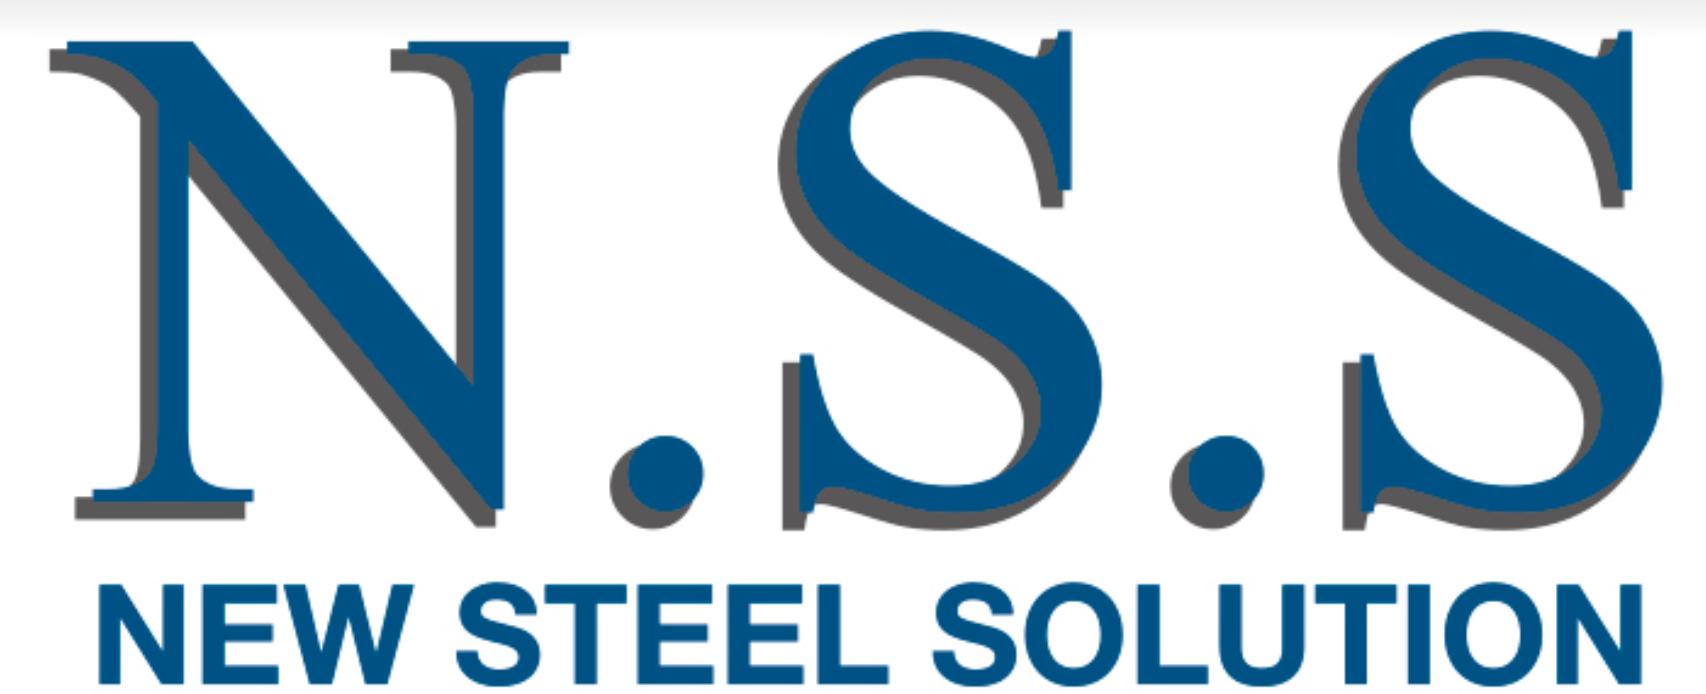 New Steel Solution